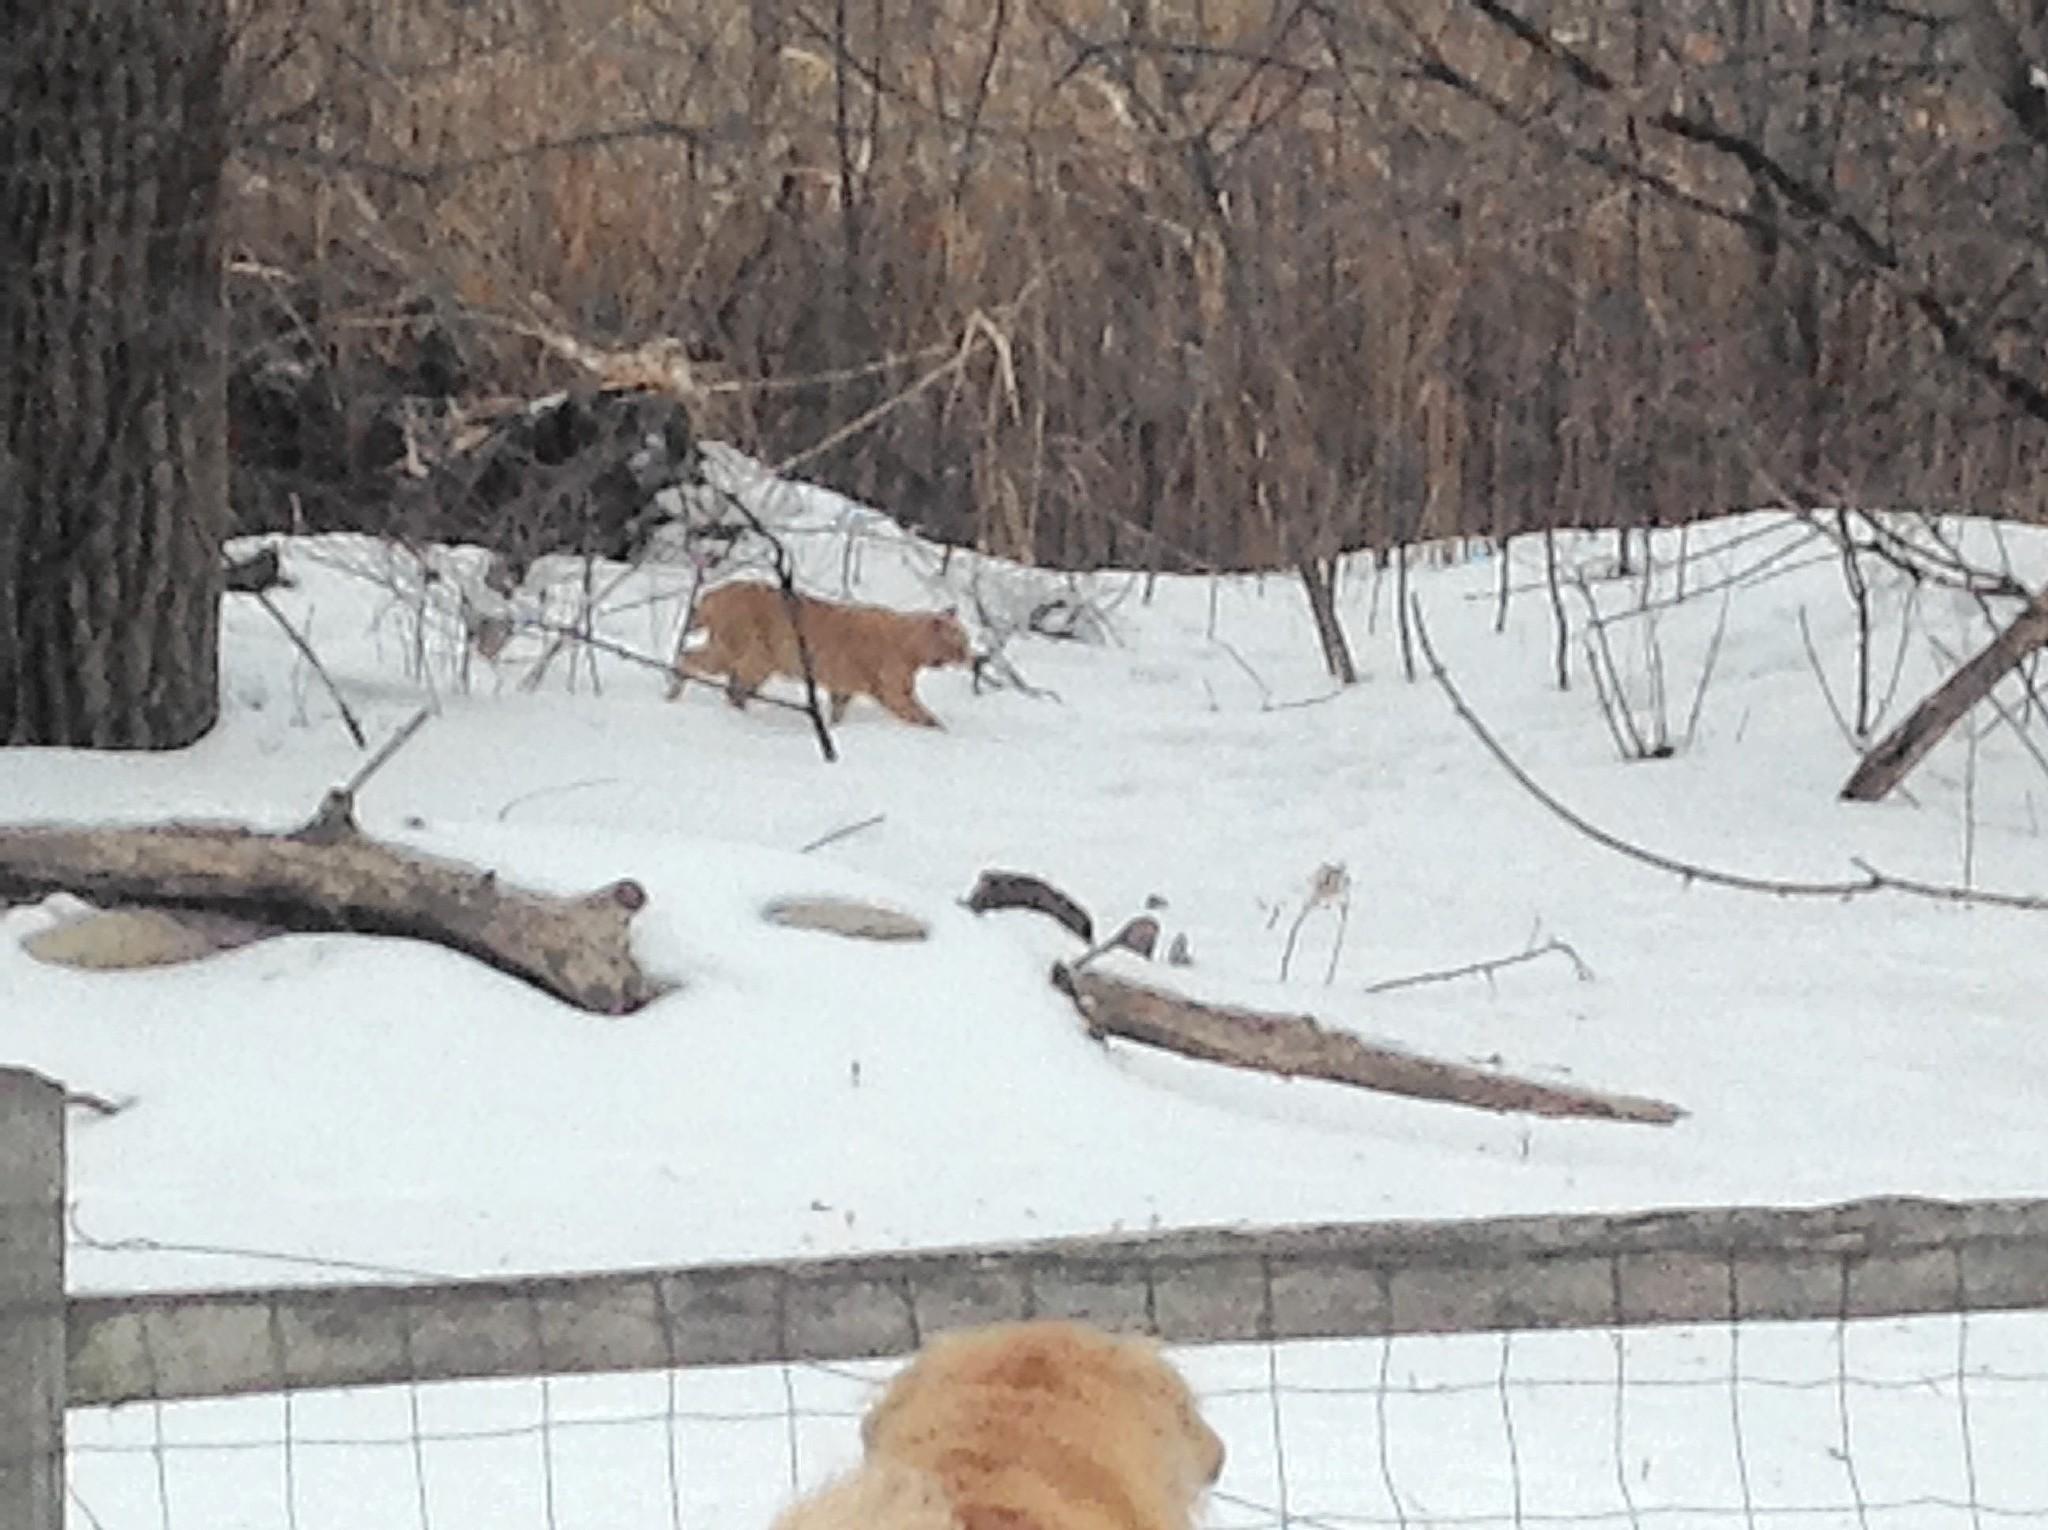 Illinois lake county wauconda - Bobcat Spotted In Wauconda Backyard Near Lake County Forest Preserve Lake County News Sun